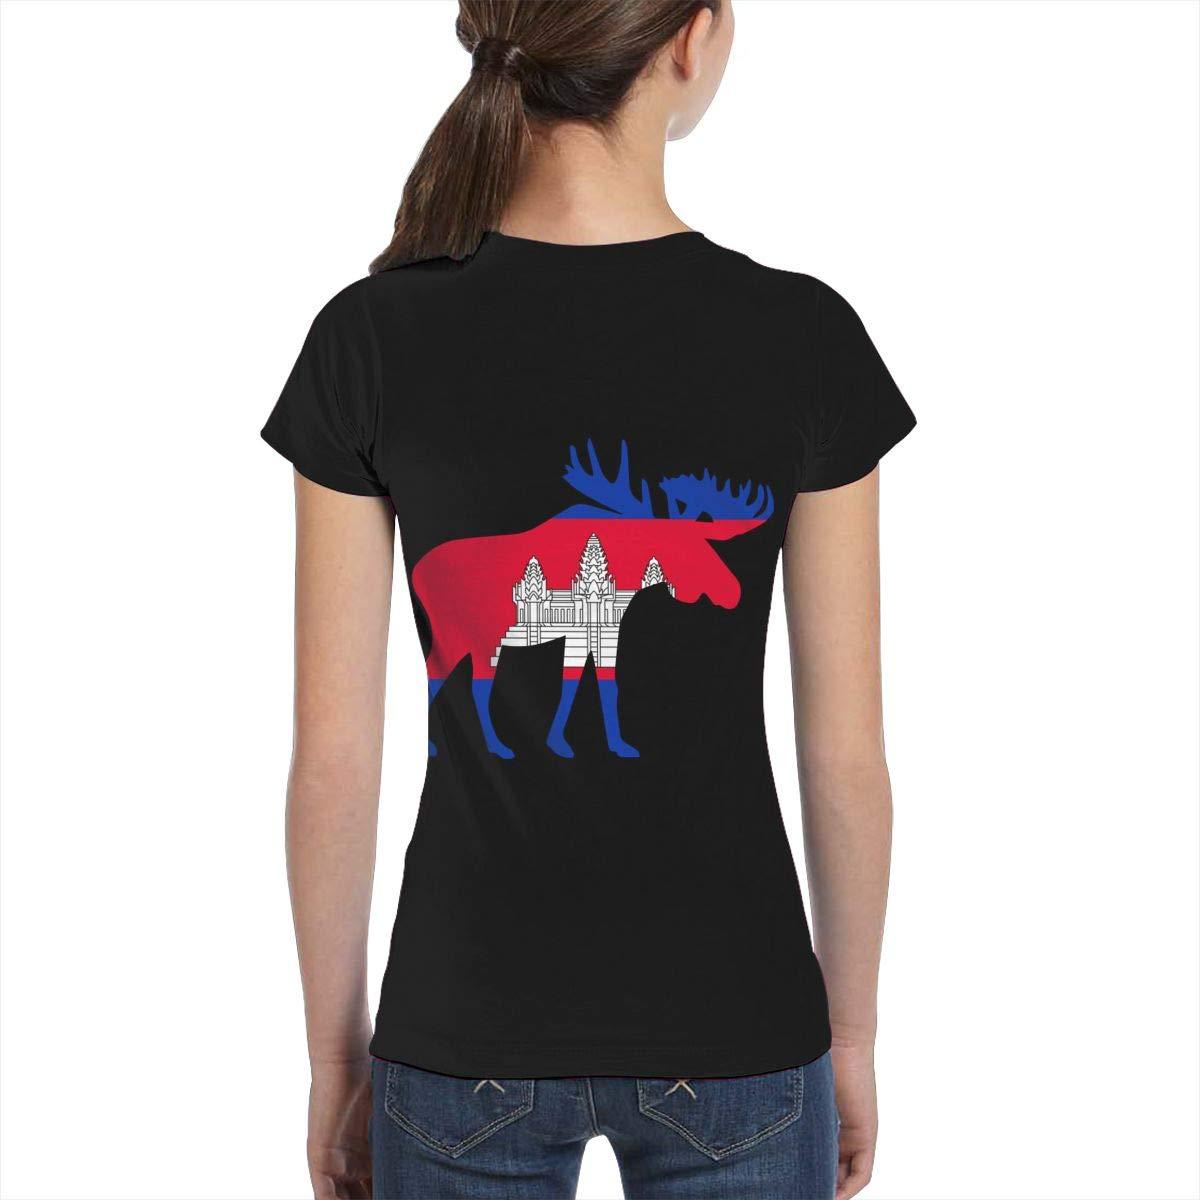 Fashion Tunic Shirt Dress L6Nv4o@A Girls Short Sleeve Cambodia Moose Shirts XS-XL